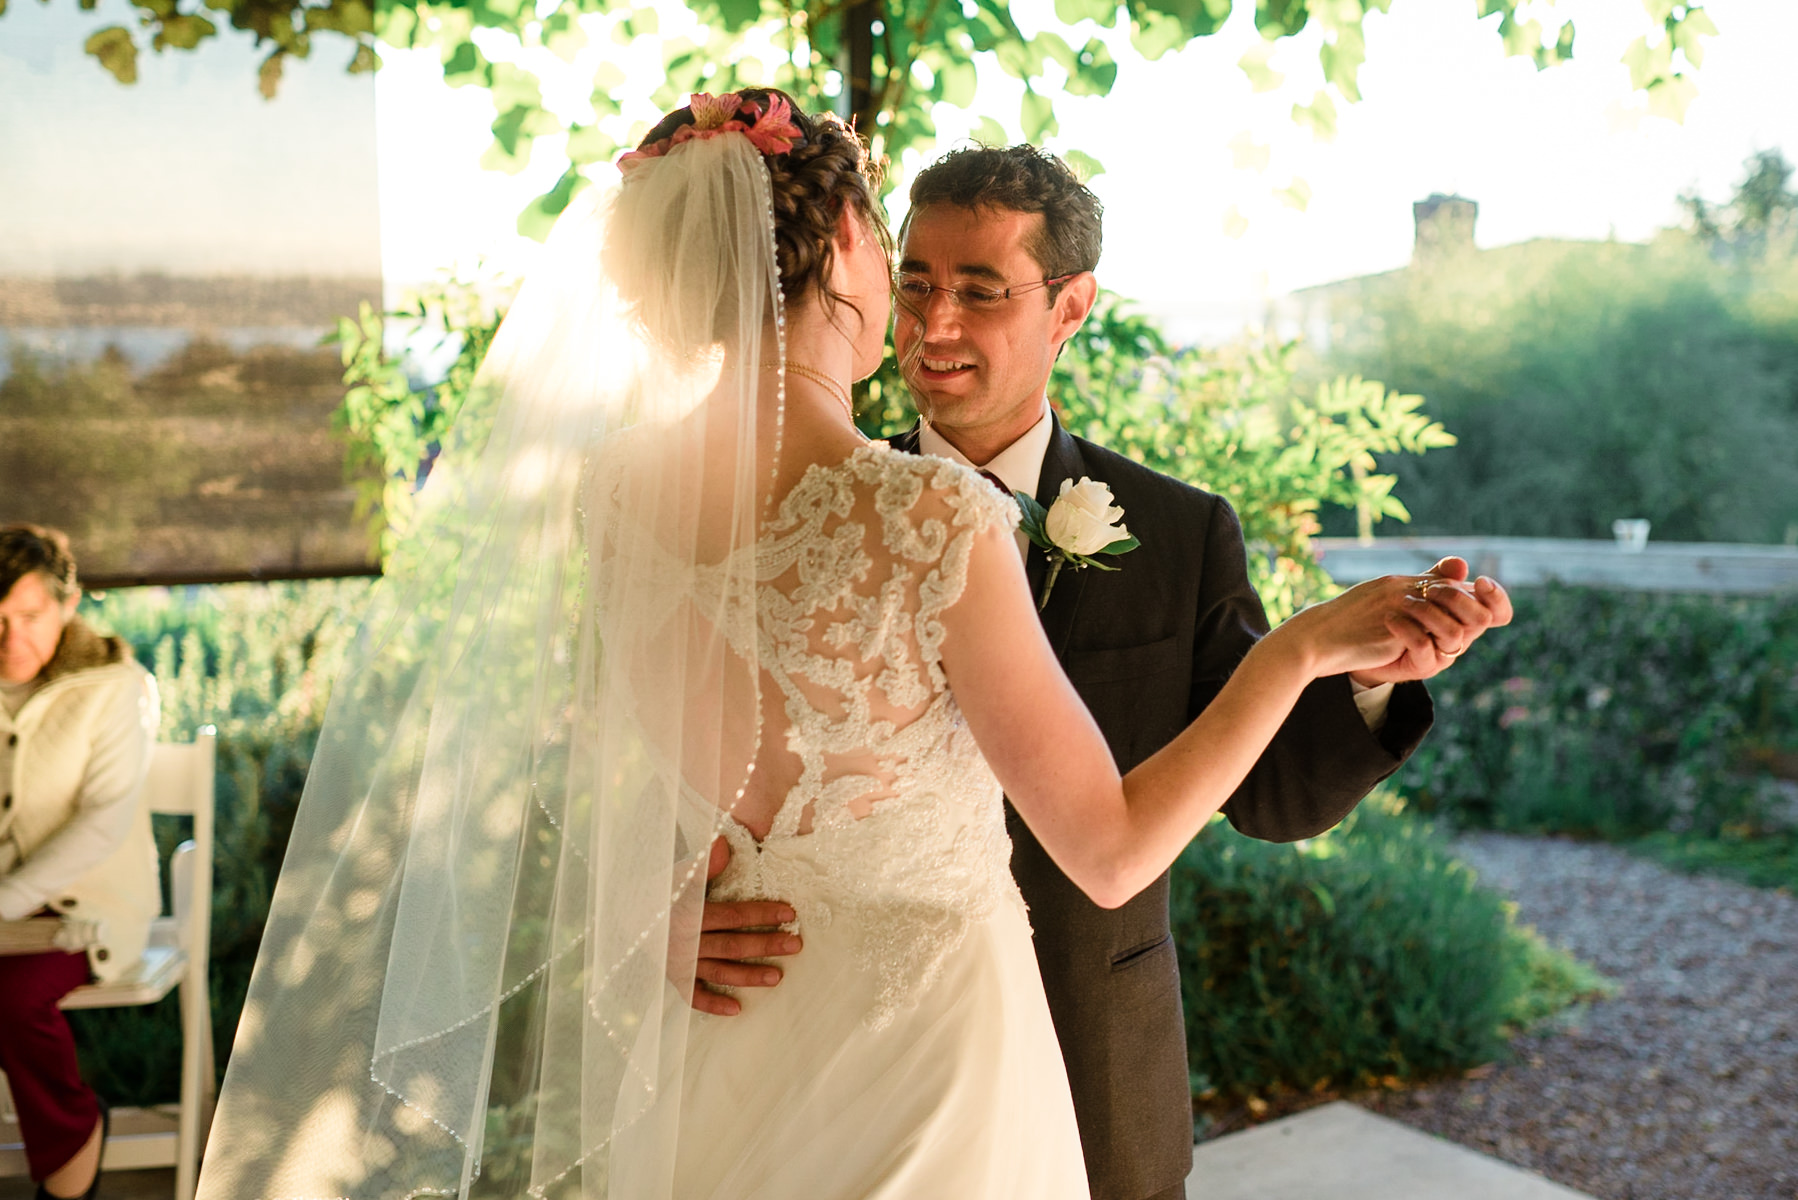 Andrew Tat - Documentary Wedding Photography - Kirkland, Washington - Emily & Cuauh - 45.JPG